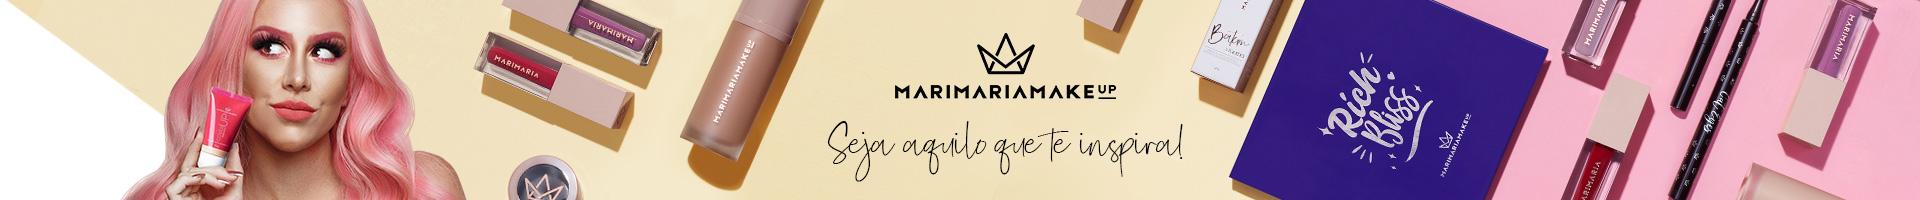 Mari Maria